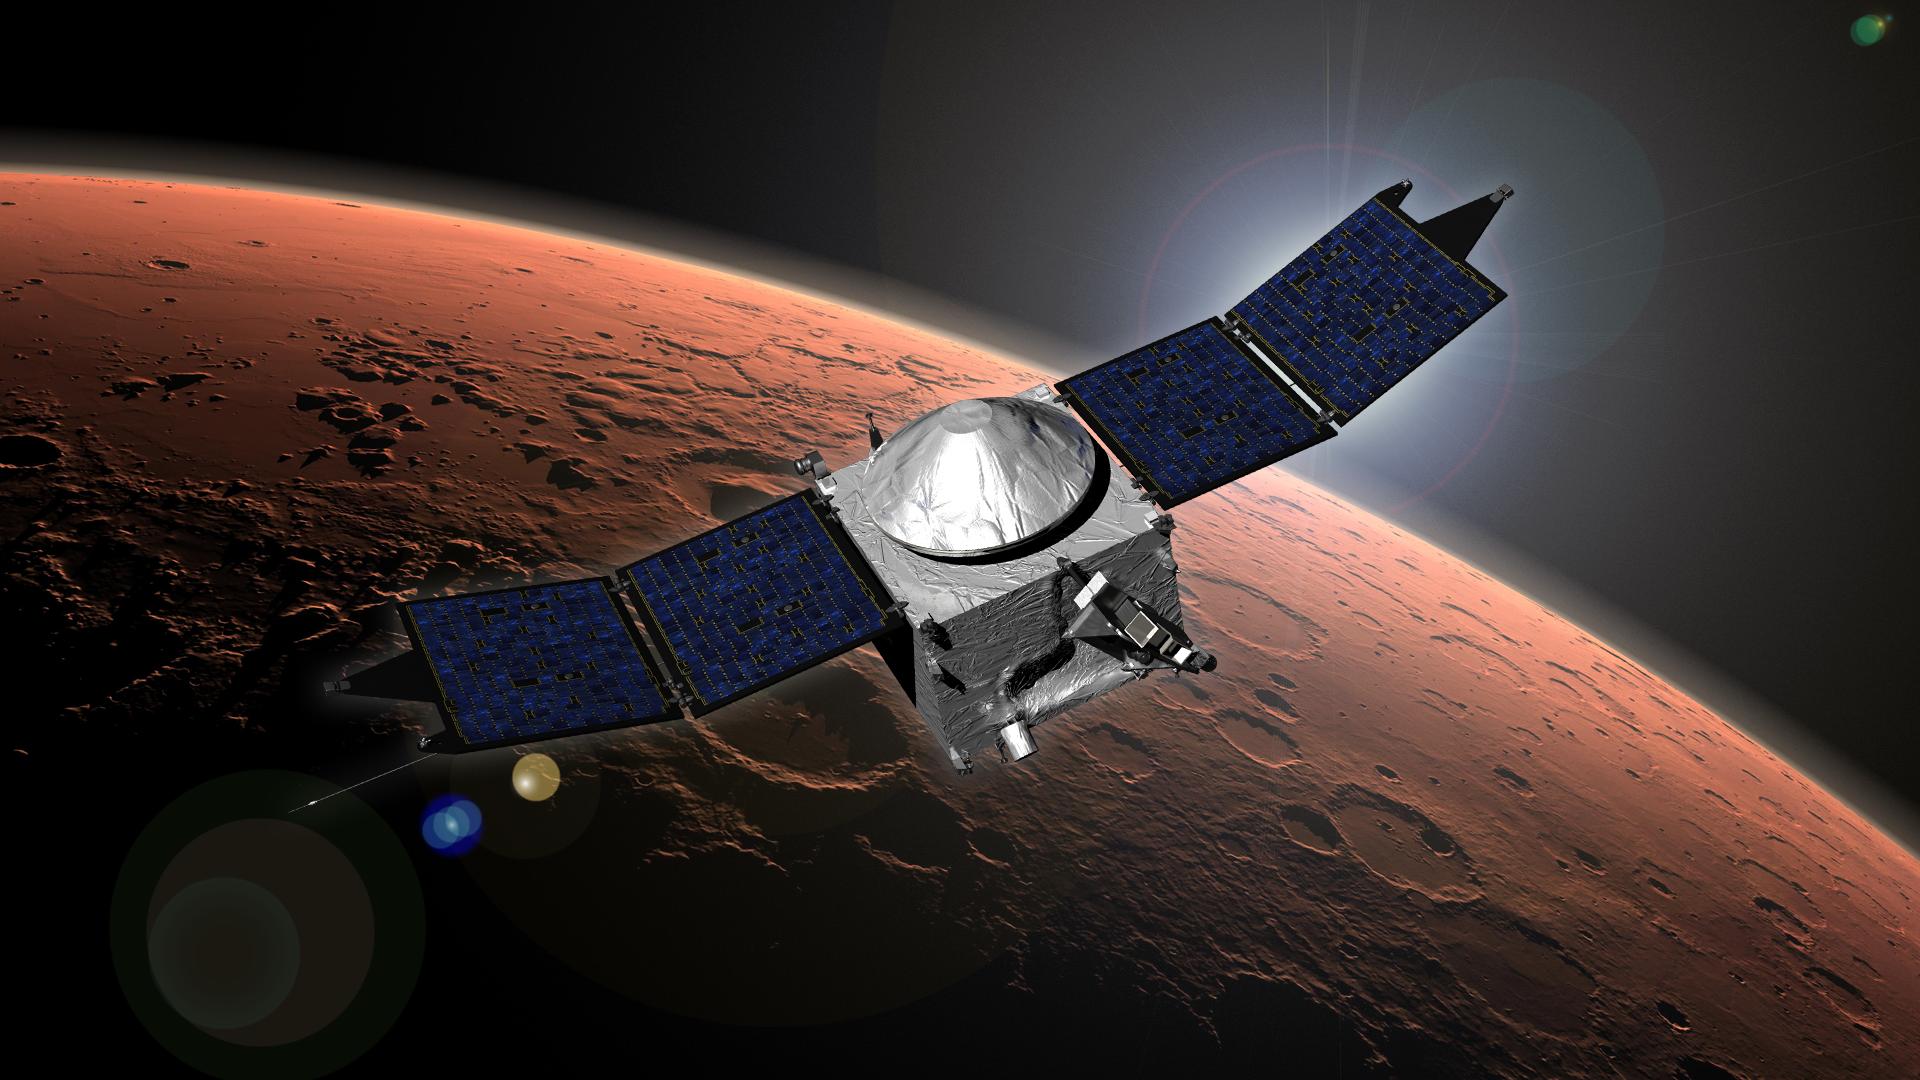 Artist's concept of NASA's MAVEN spacecraft at Mars. Credit: NASA/GSFC